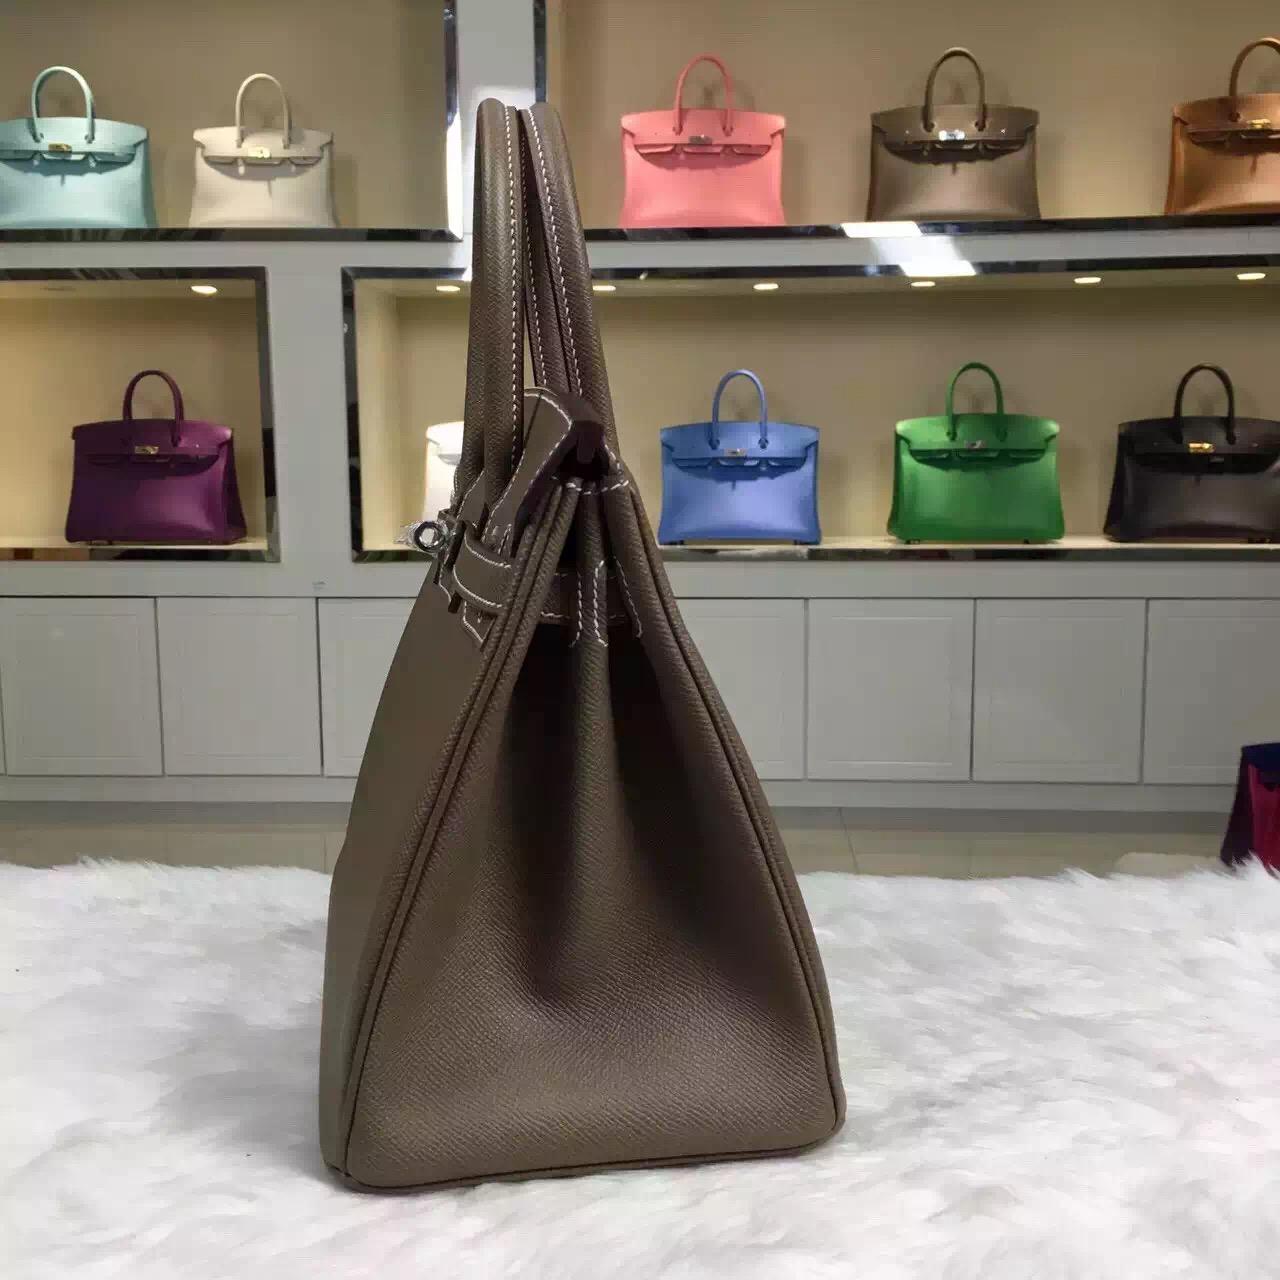 Hot Sale Hermes C81 Etoupe Grey Original Epsom Leather Birkin Bag 30cm